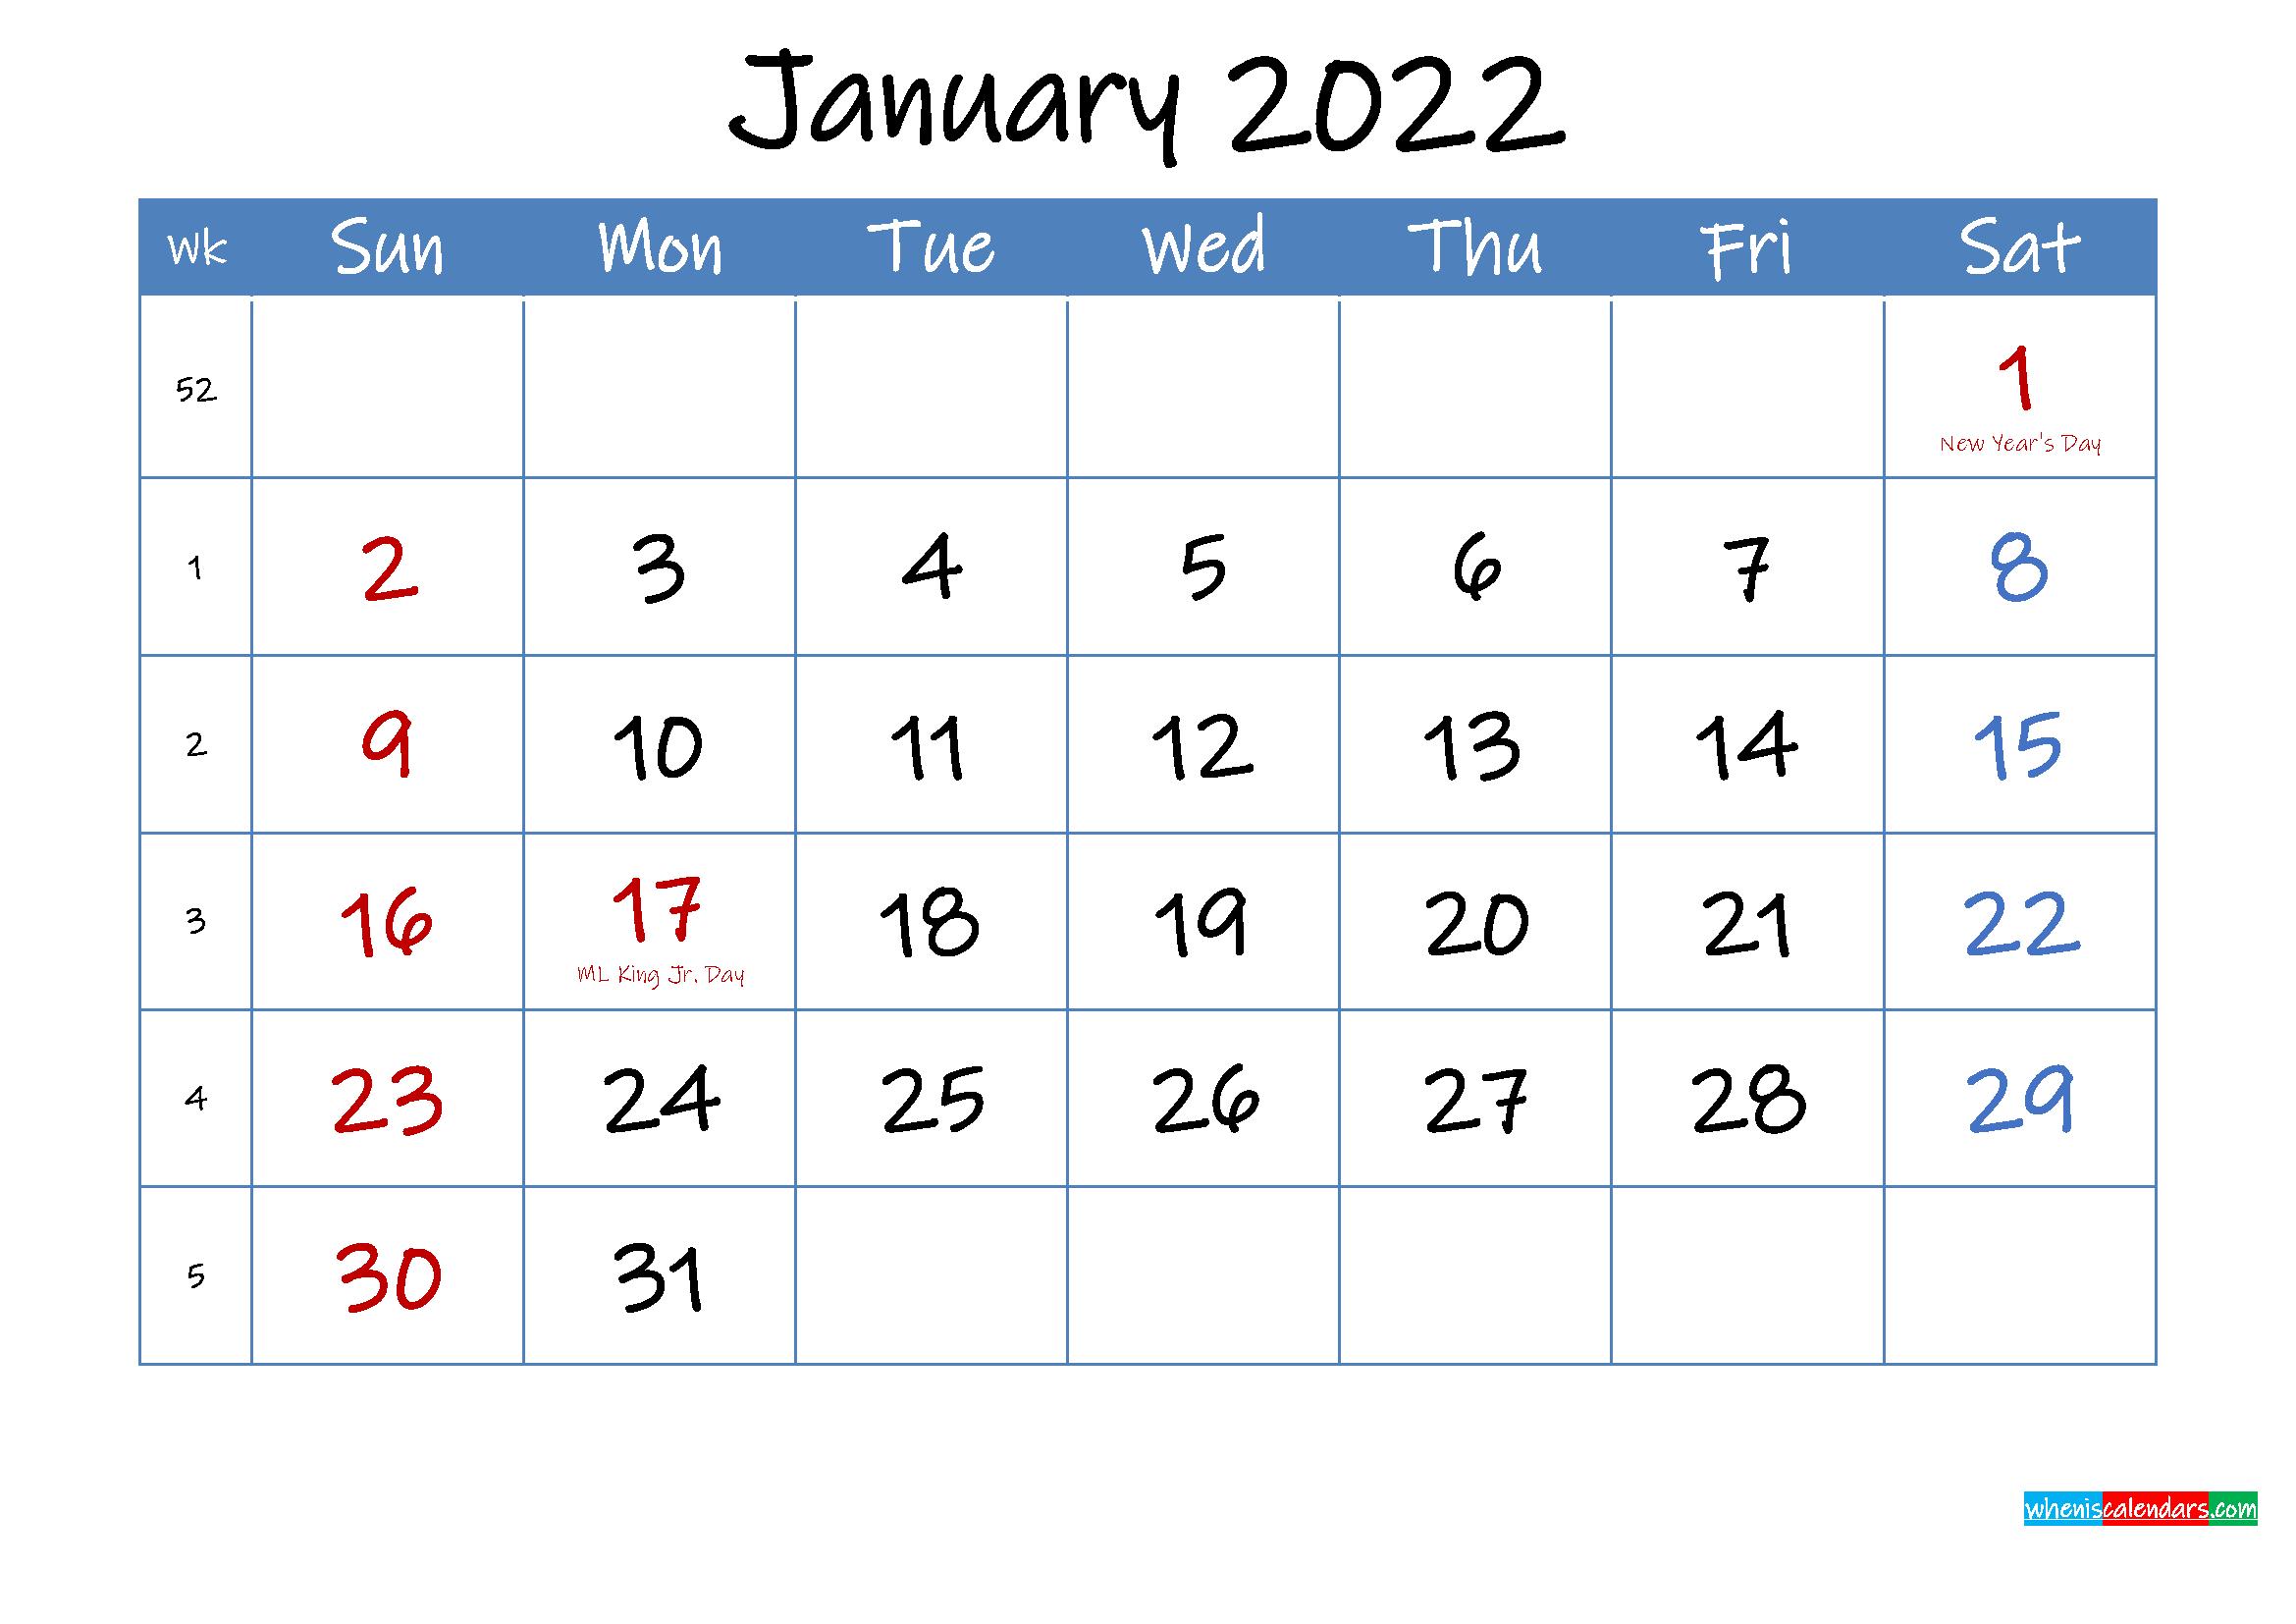 Printable January 2022 Calendar Word - Template Ink22M13 with regard to January 2022 Calendar Printable Free Graphics